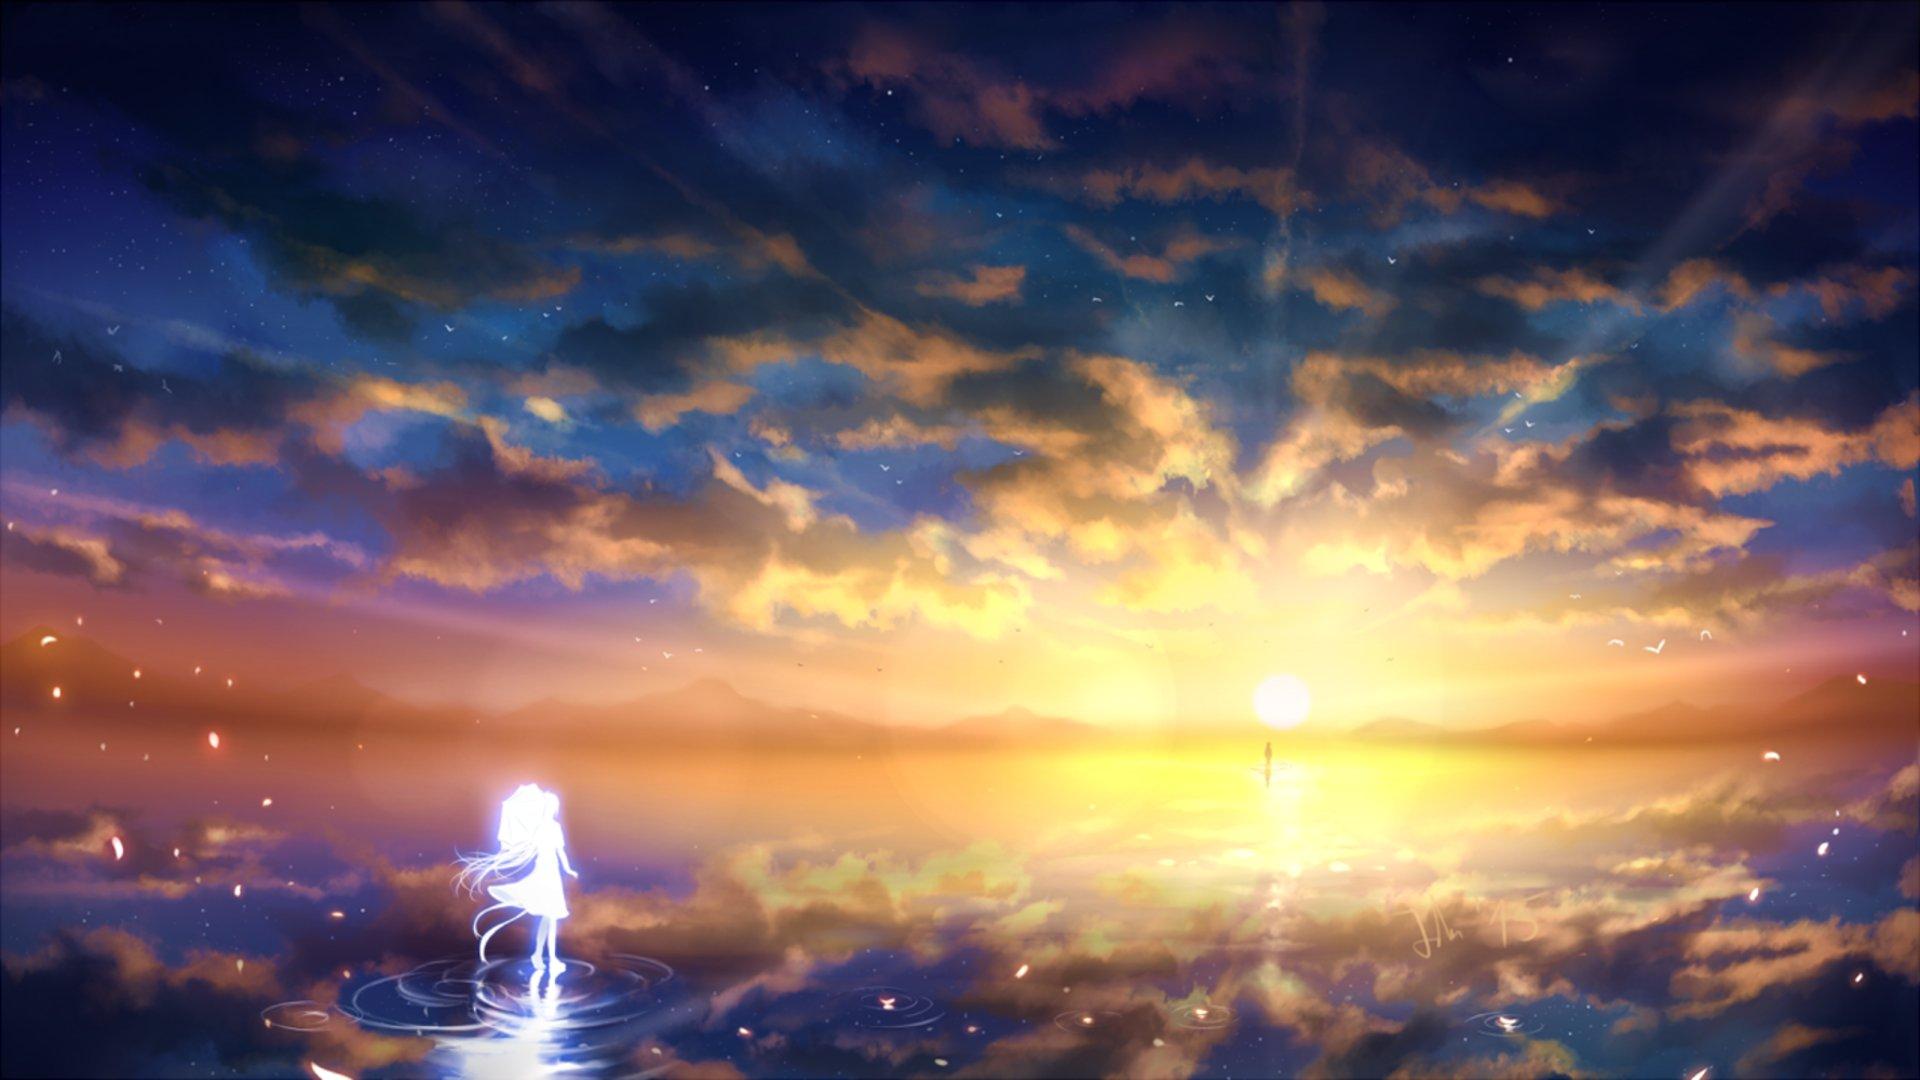 Anime girl sunset sky clouds beauty landscape wallpaper ...